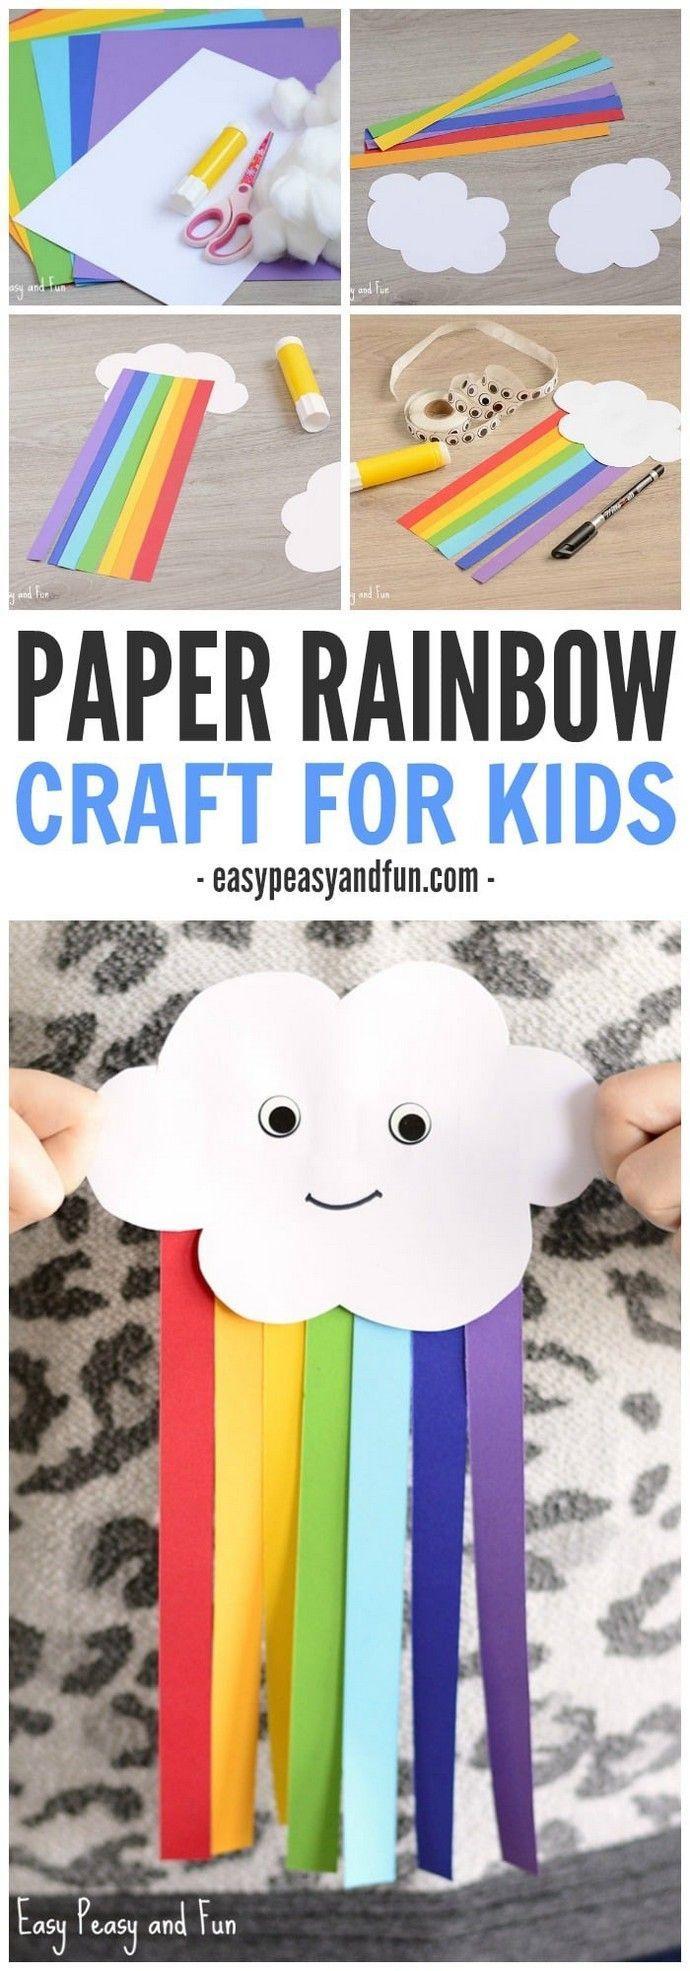 Easy handicrafts for children - #crafts #simple #children - #home cultureUnterEa ...#children #crafts #cultureunterea #easy #handicrafts #home #simple